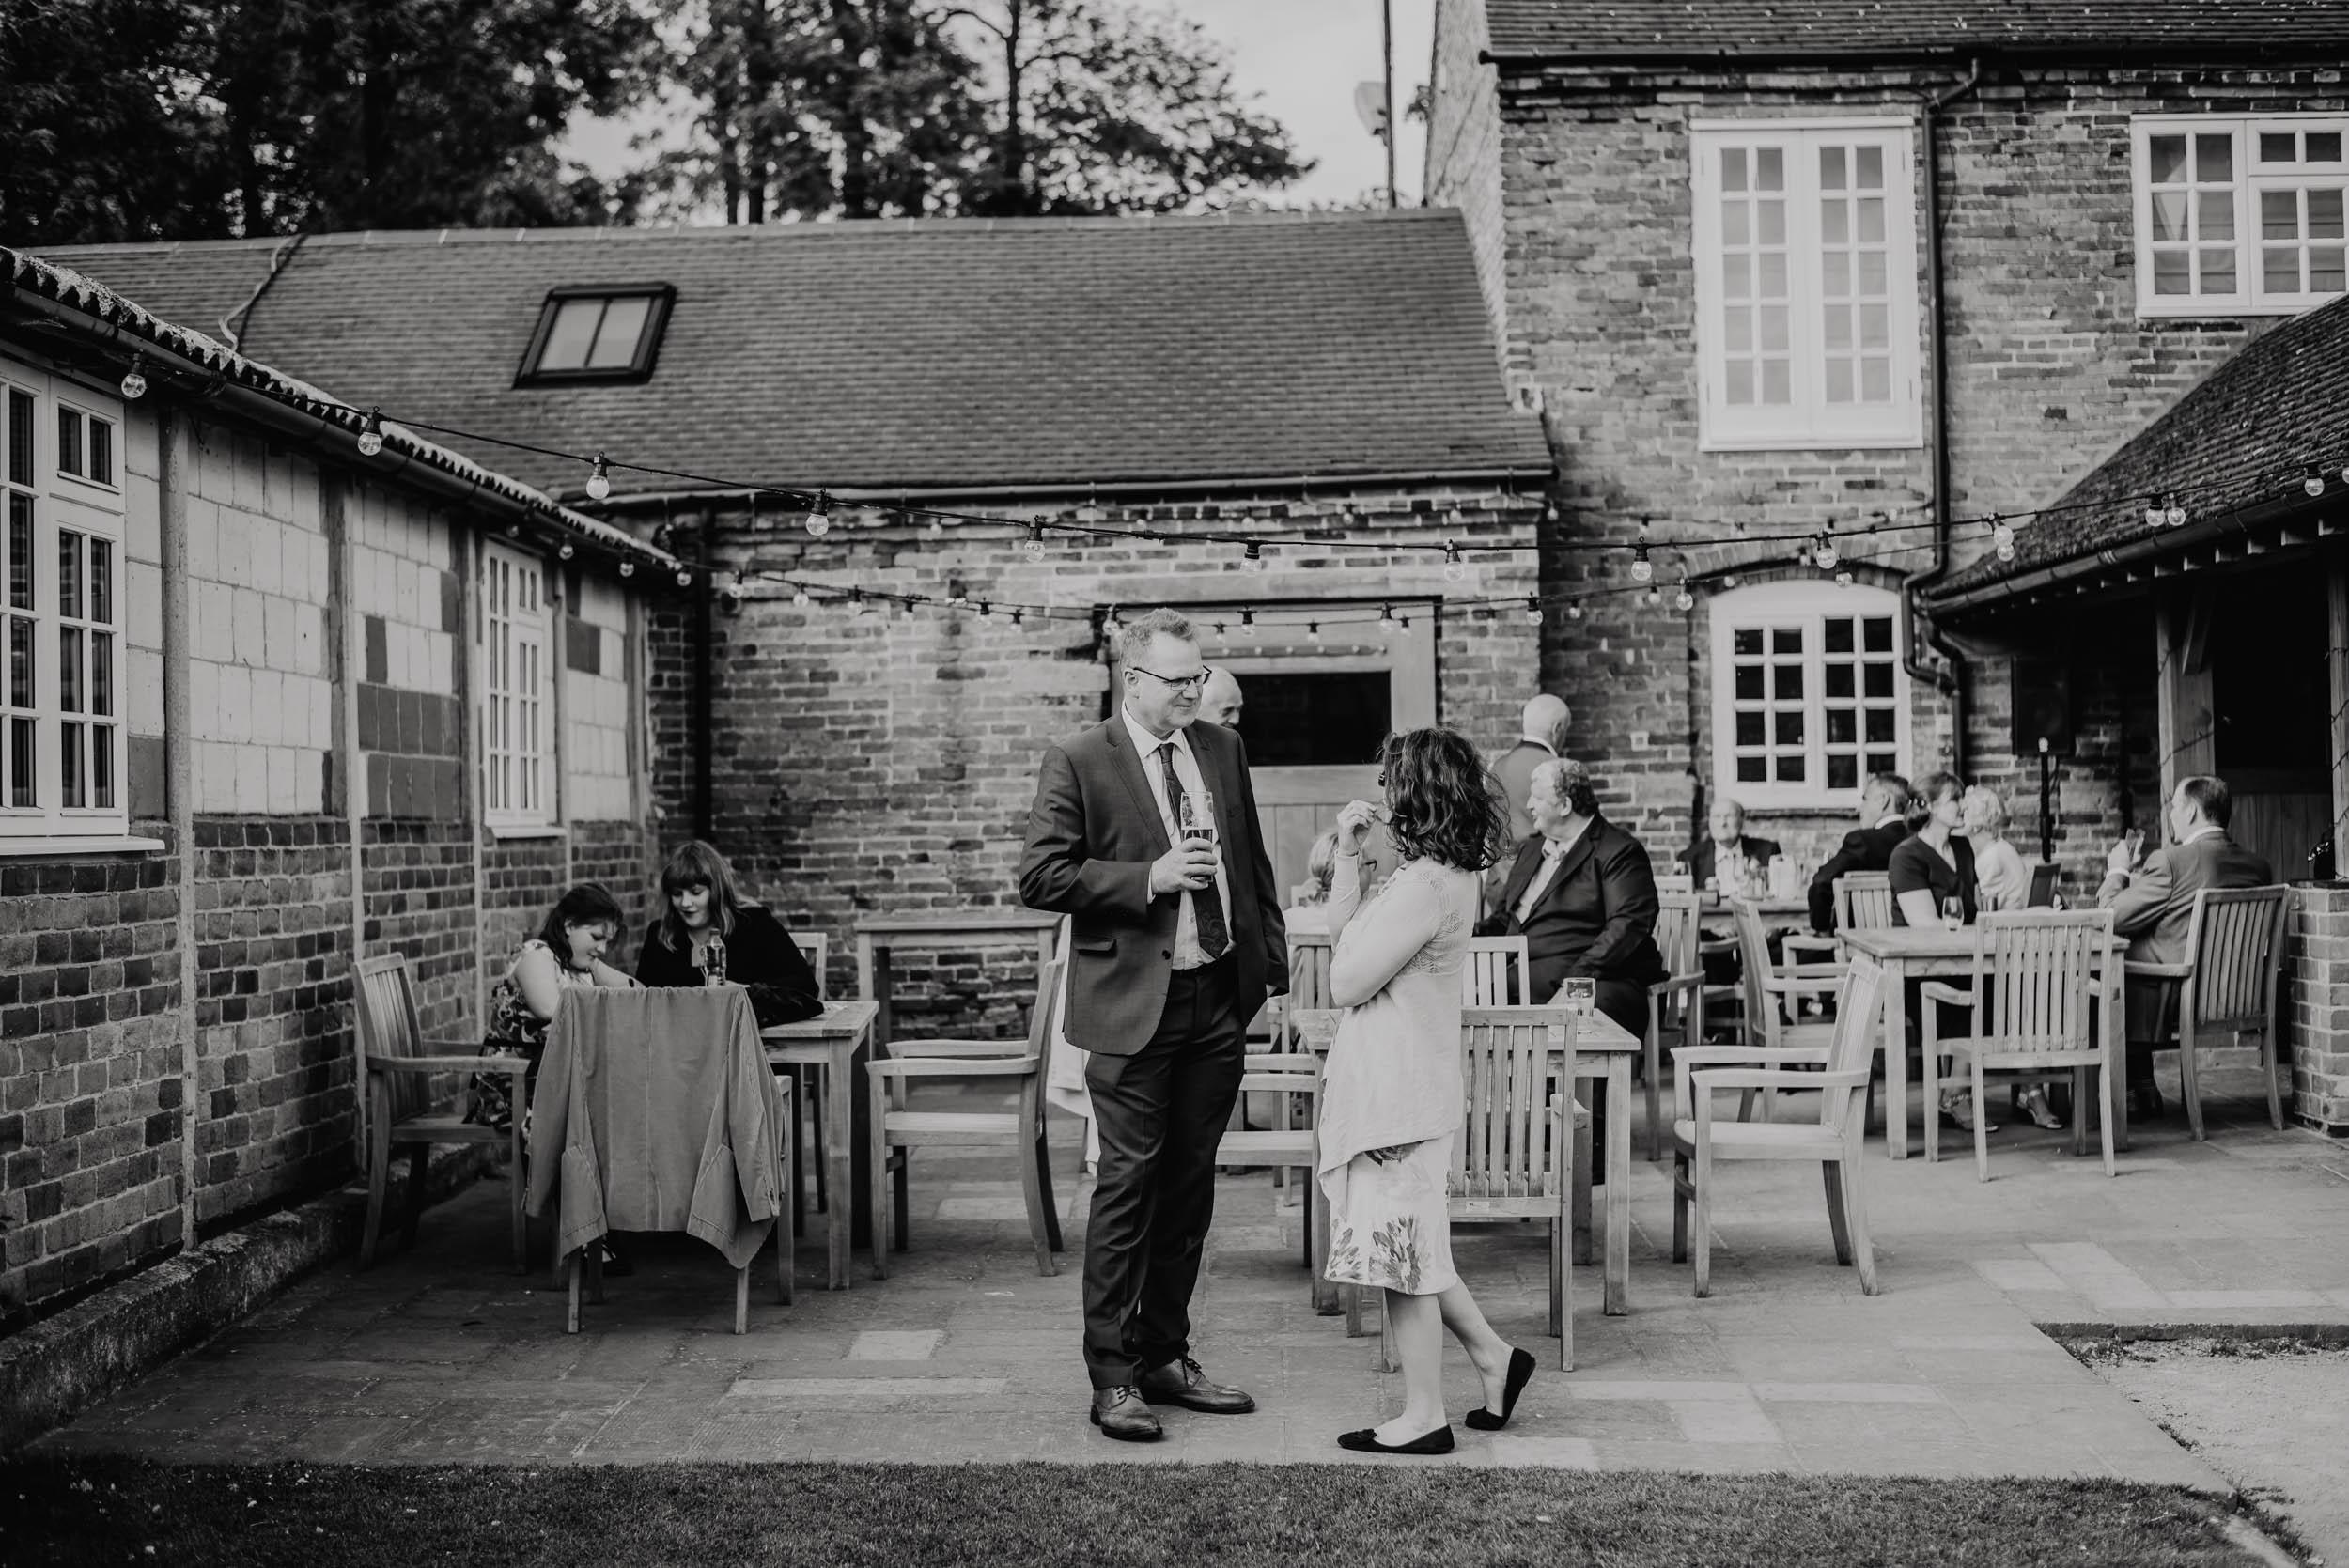 Donington-park-farm-wedding-photography-355.jpg